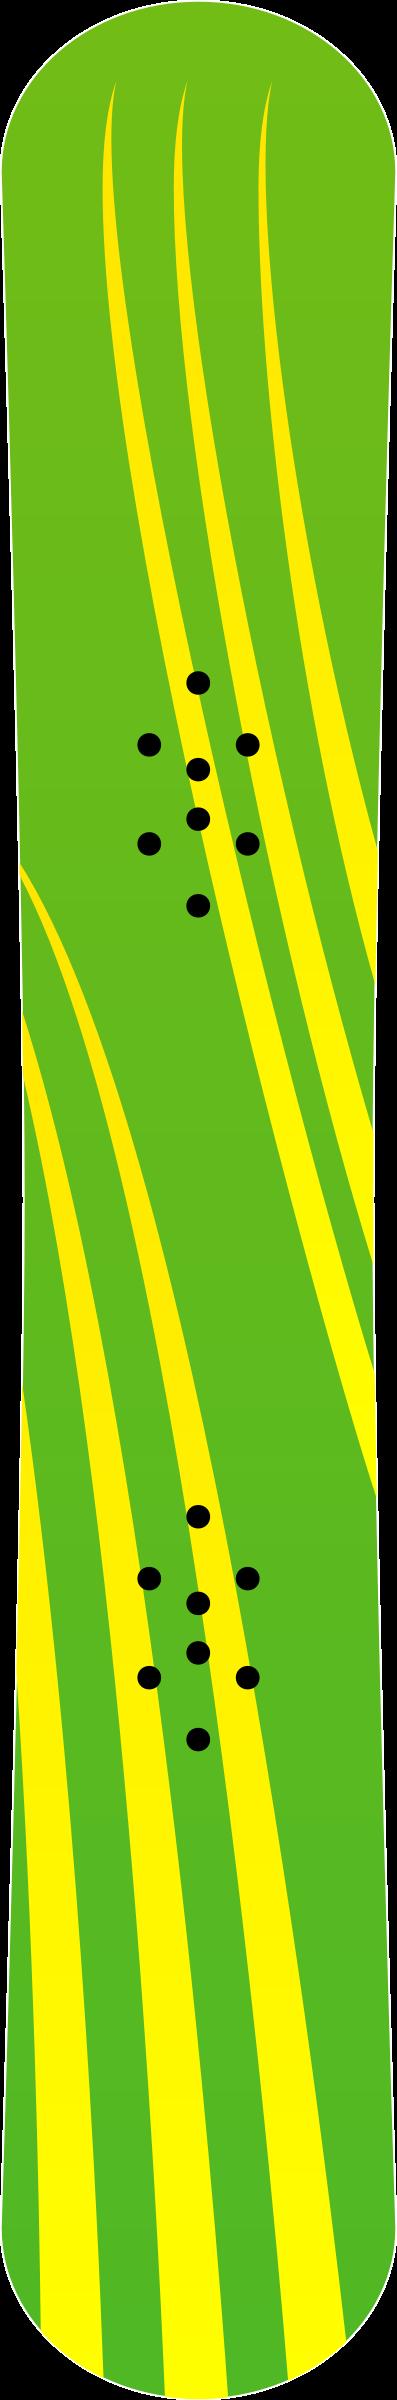 Clipart Snowboard 1